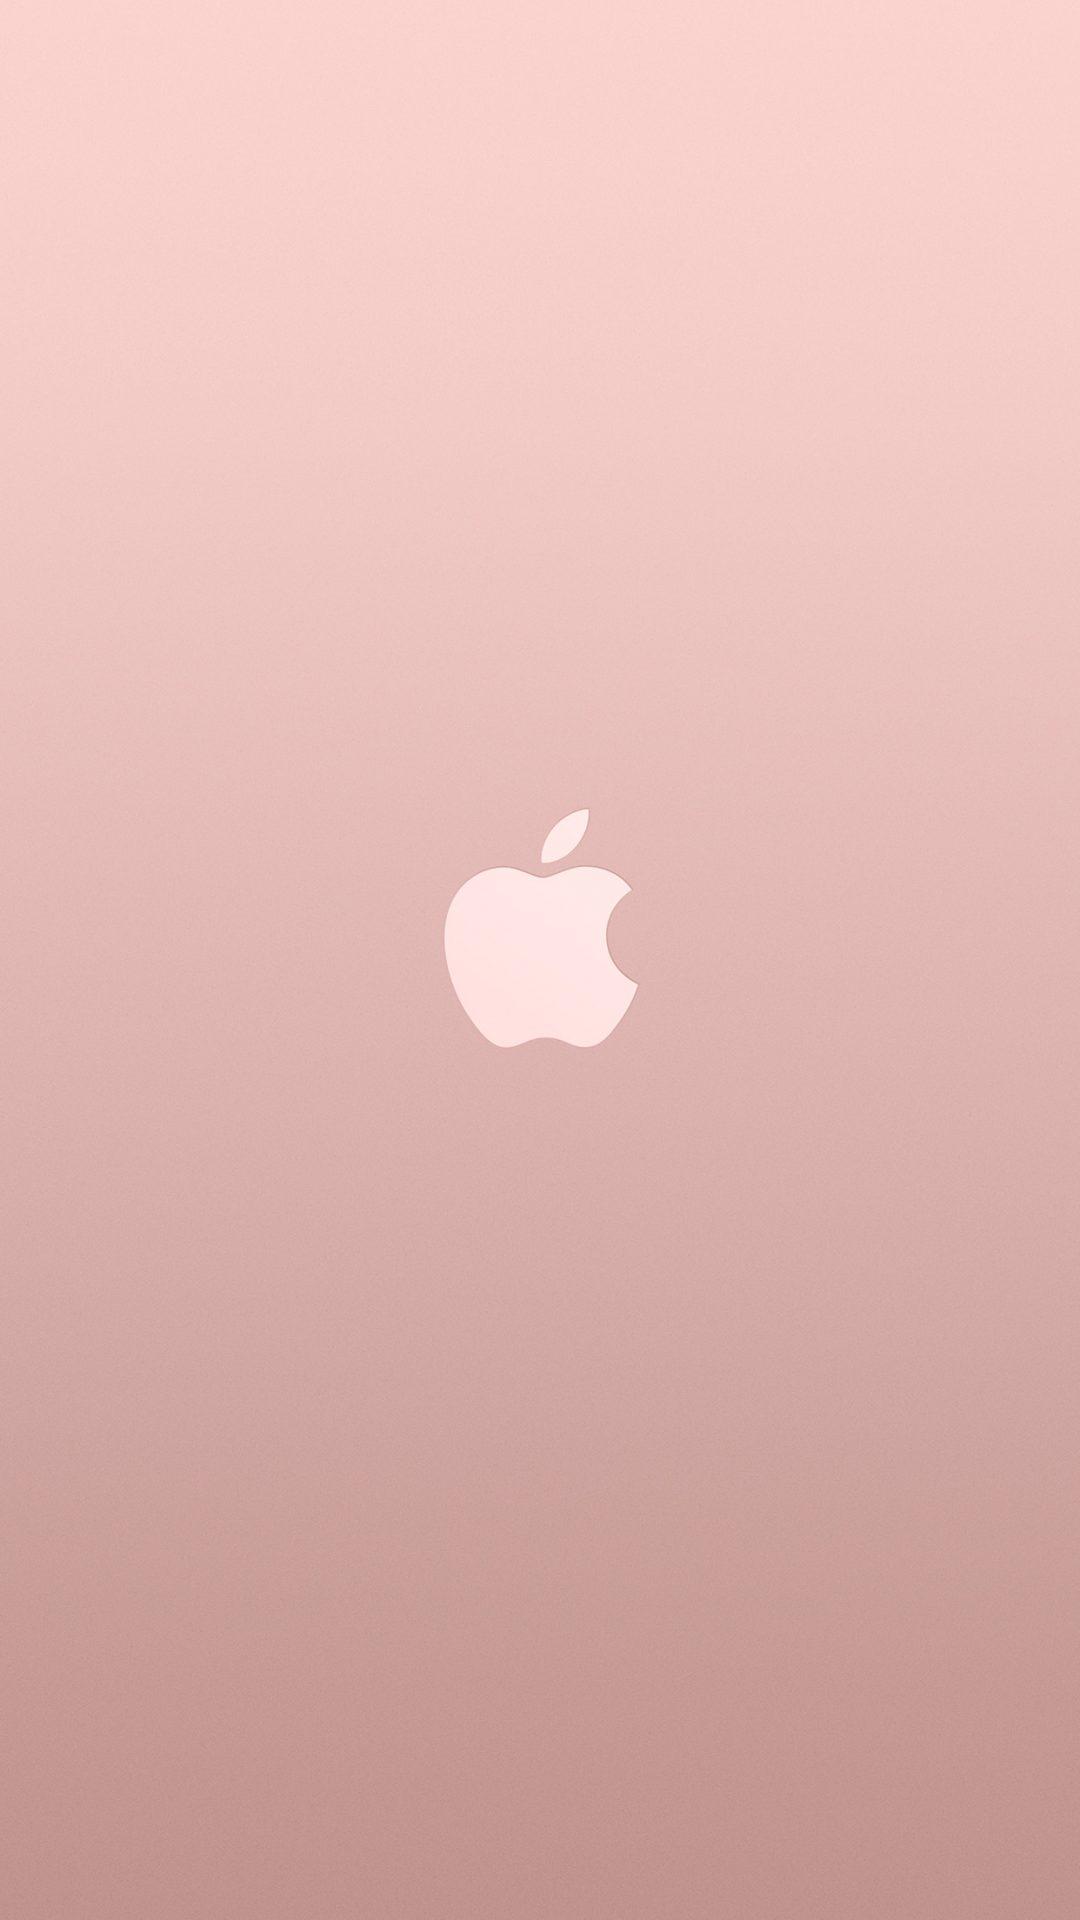 Logo Apple Pink Rose Gold White Minimal Illustration Art